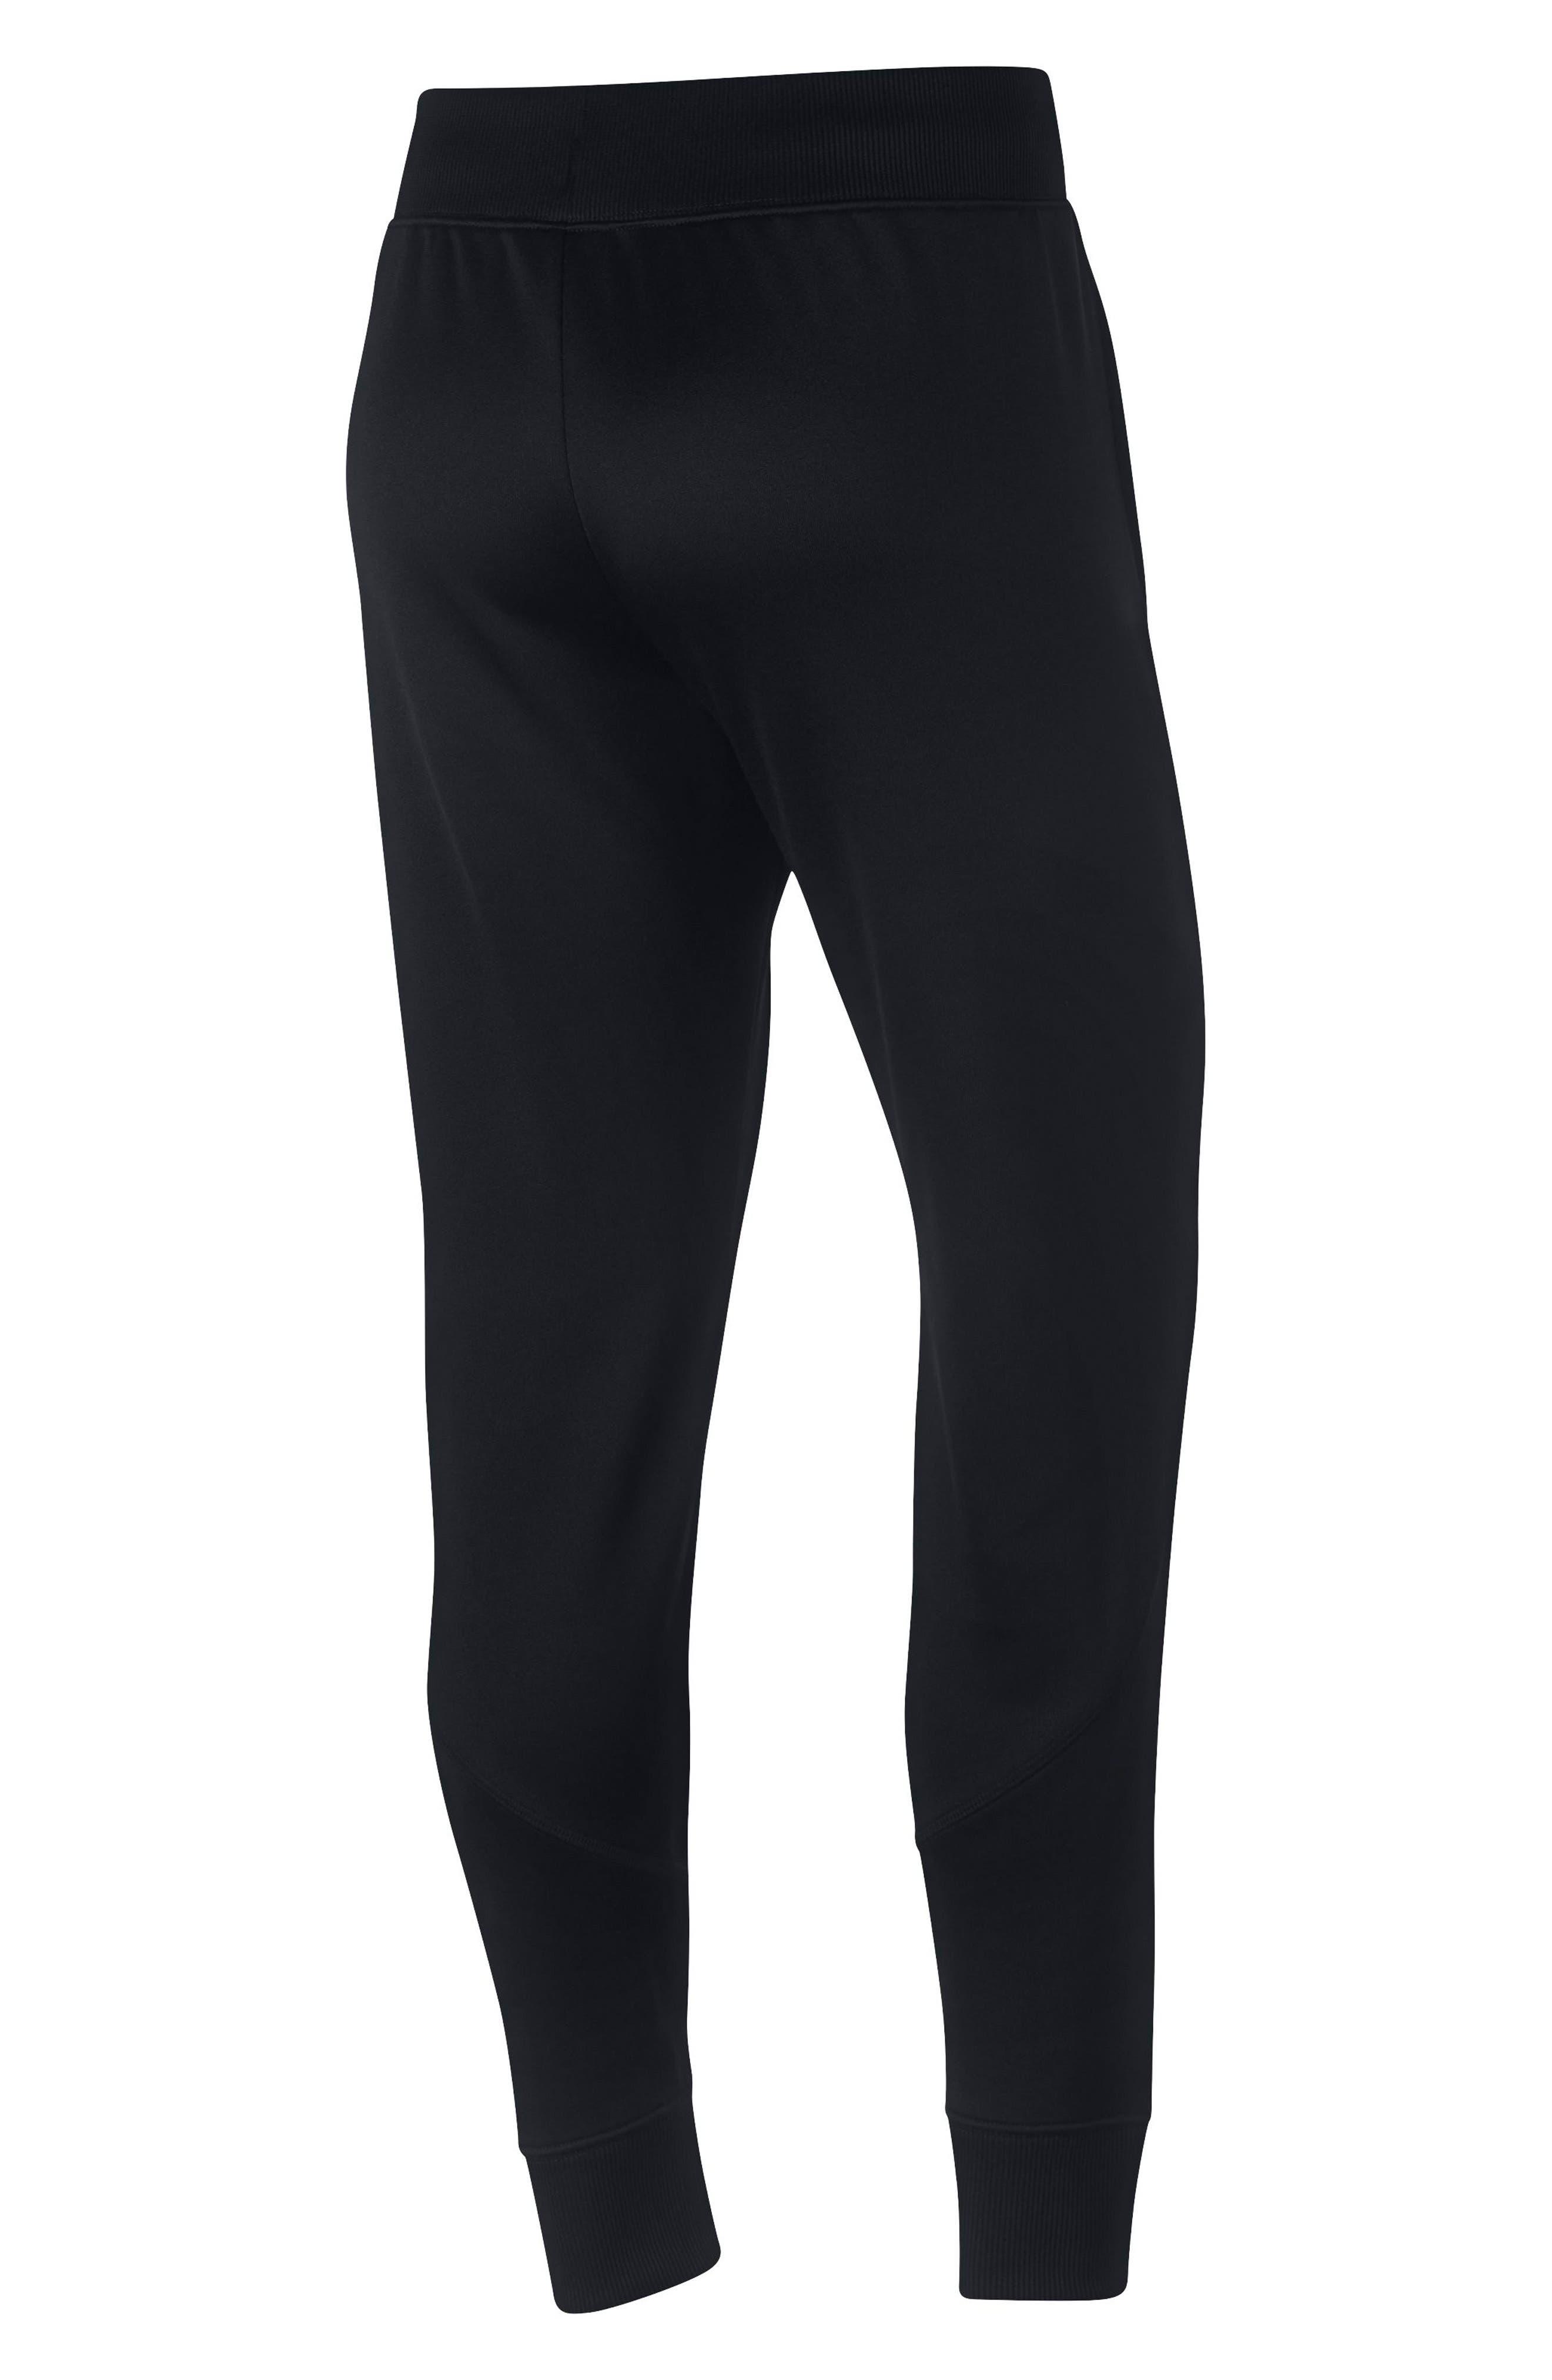 Sportswear Air Jogger Pants,                             Alternate thumbnail 8, color,                             010